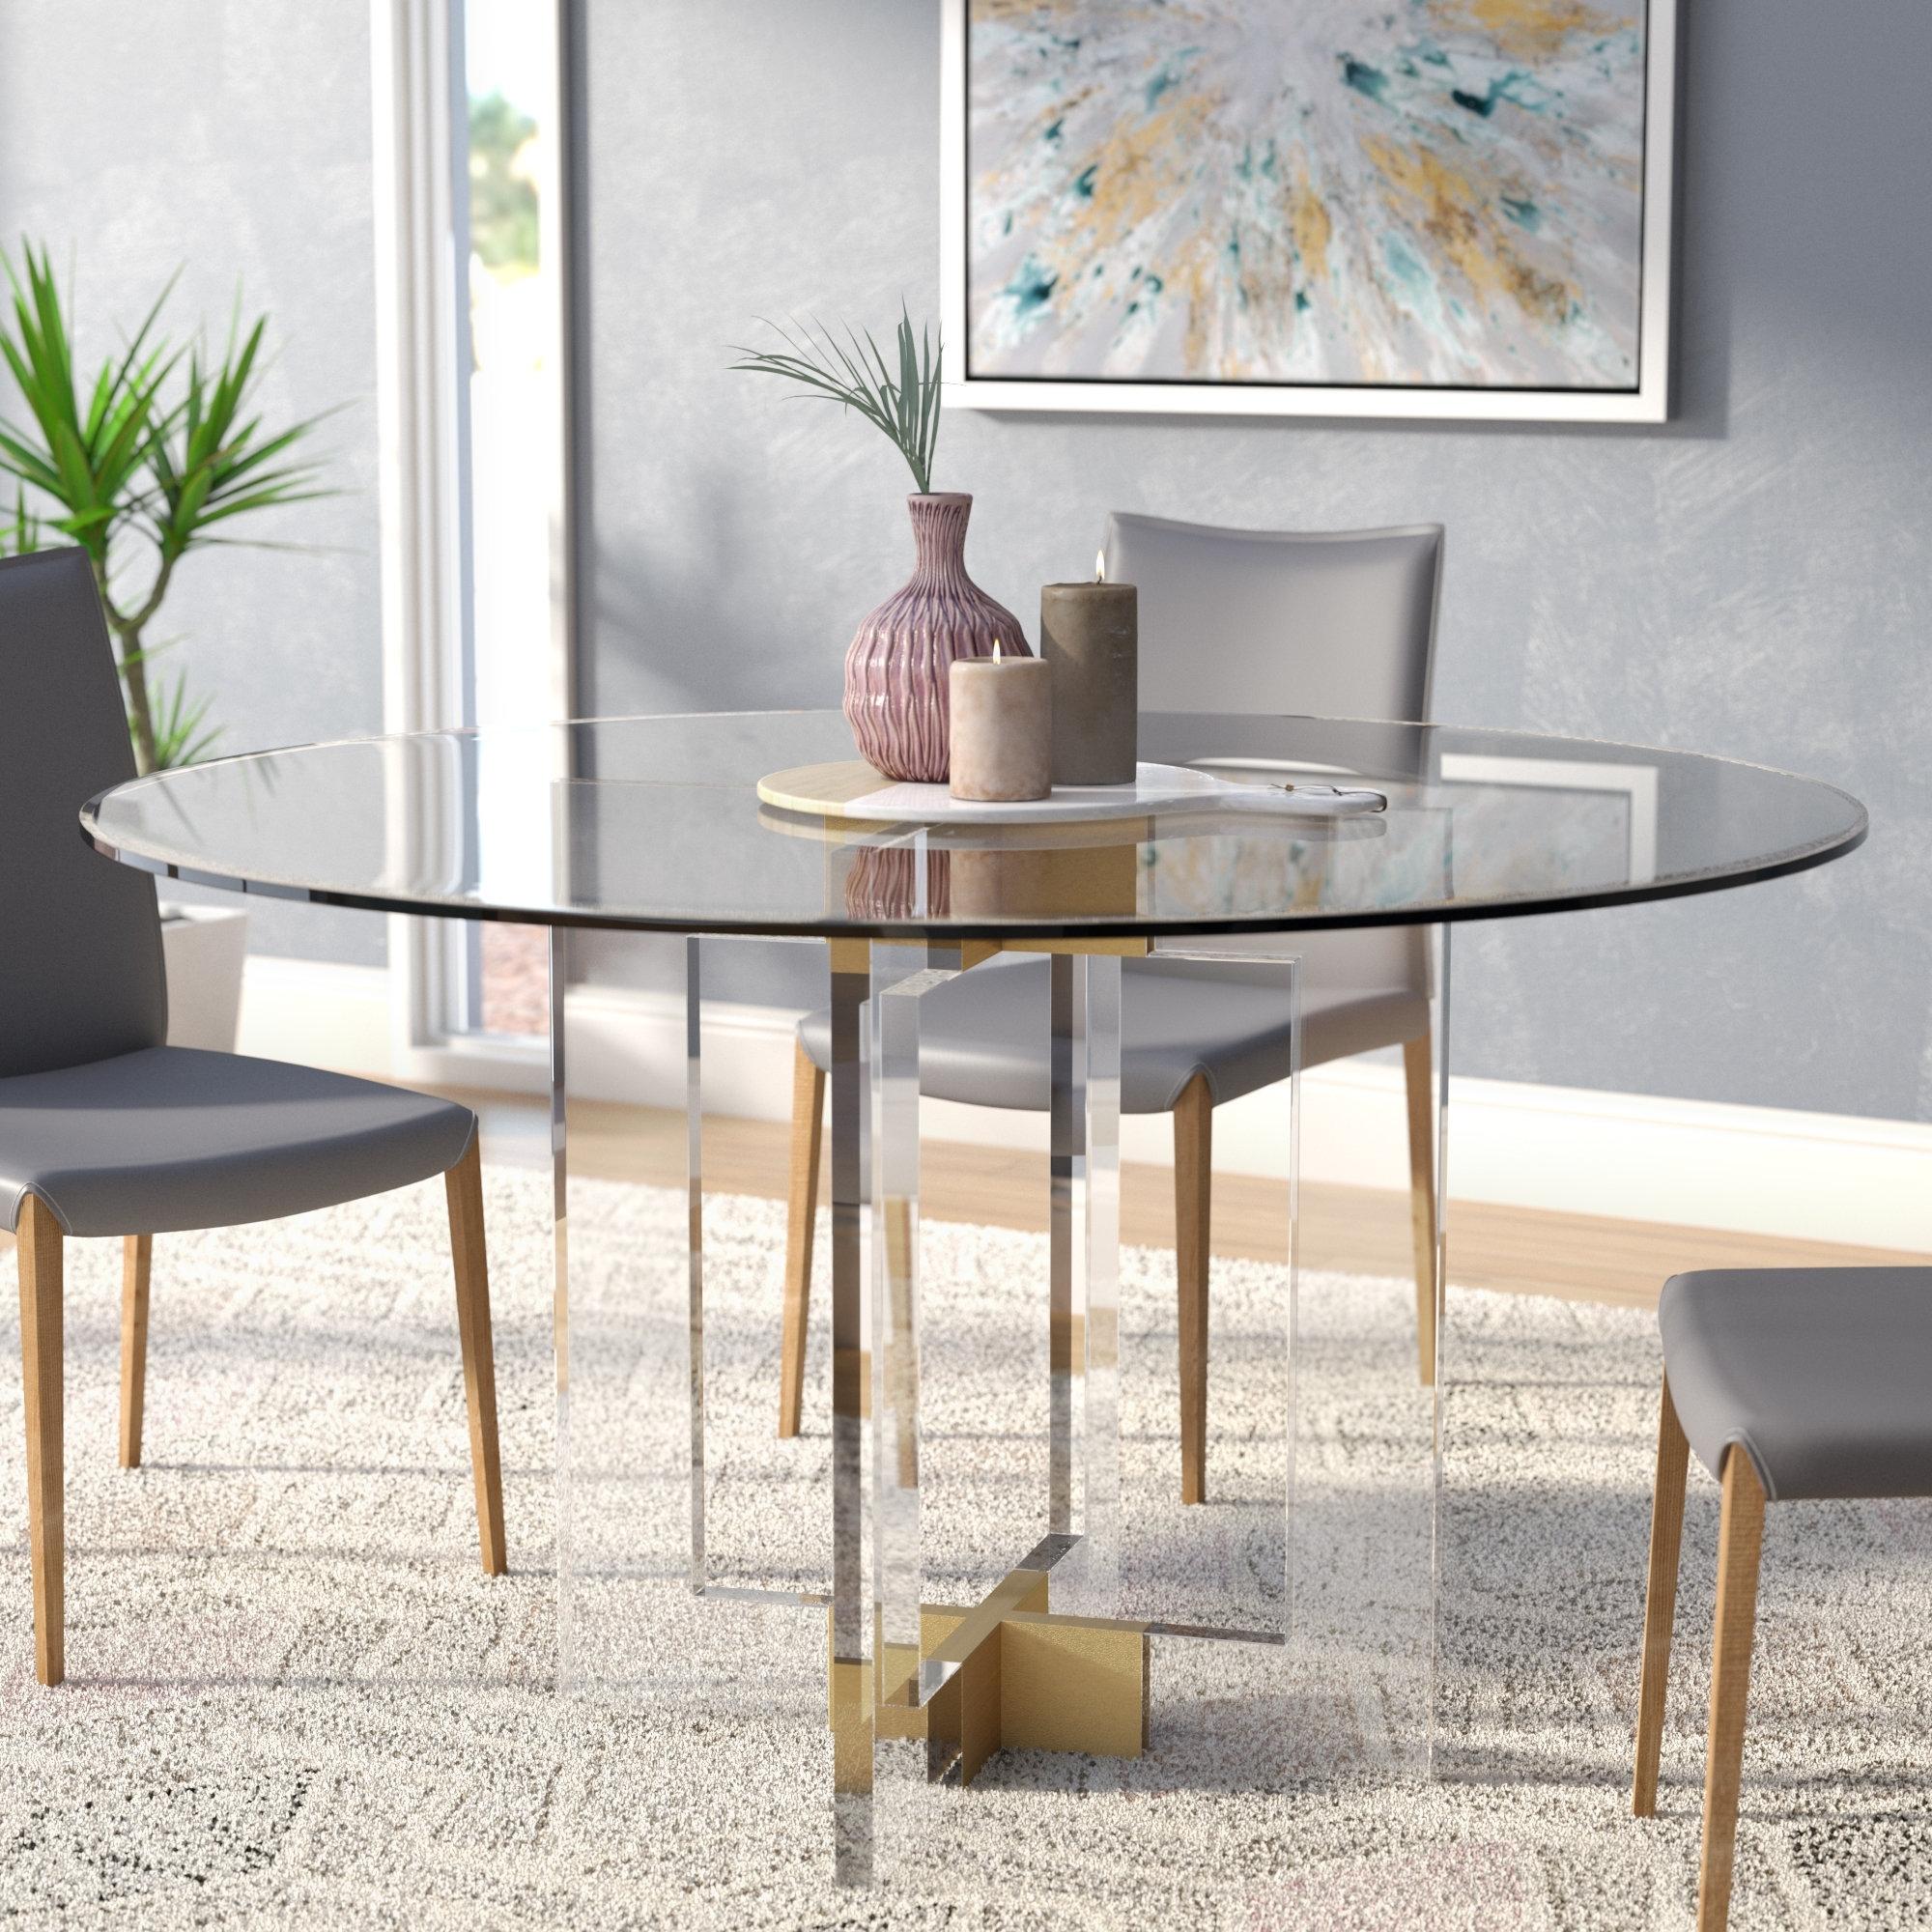 Wayfair Regarding Glass Dining Tables (View 22 of 25)